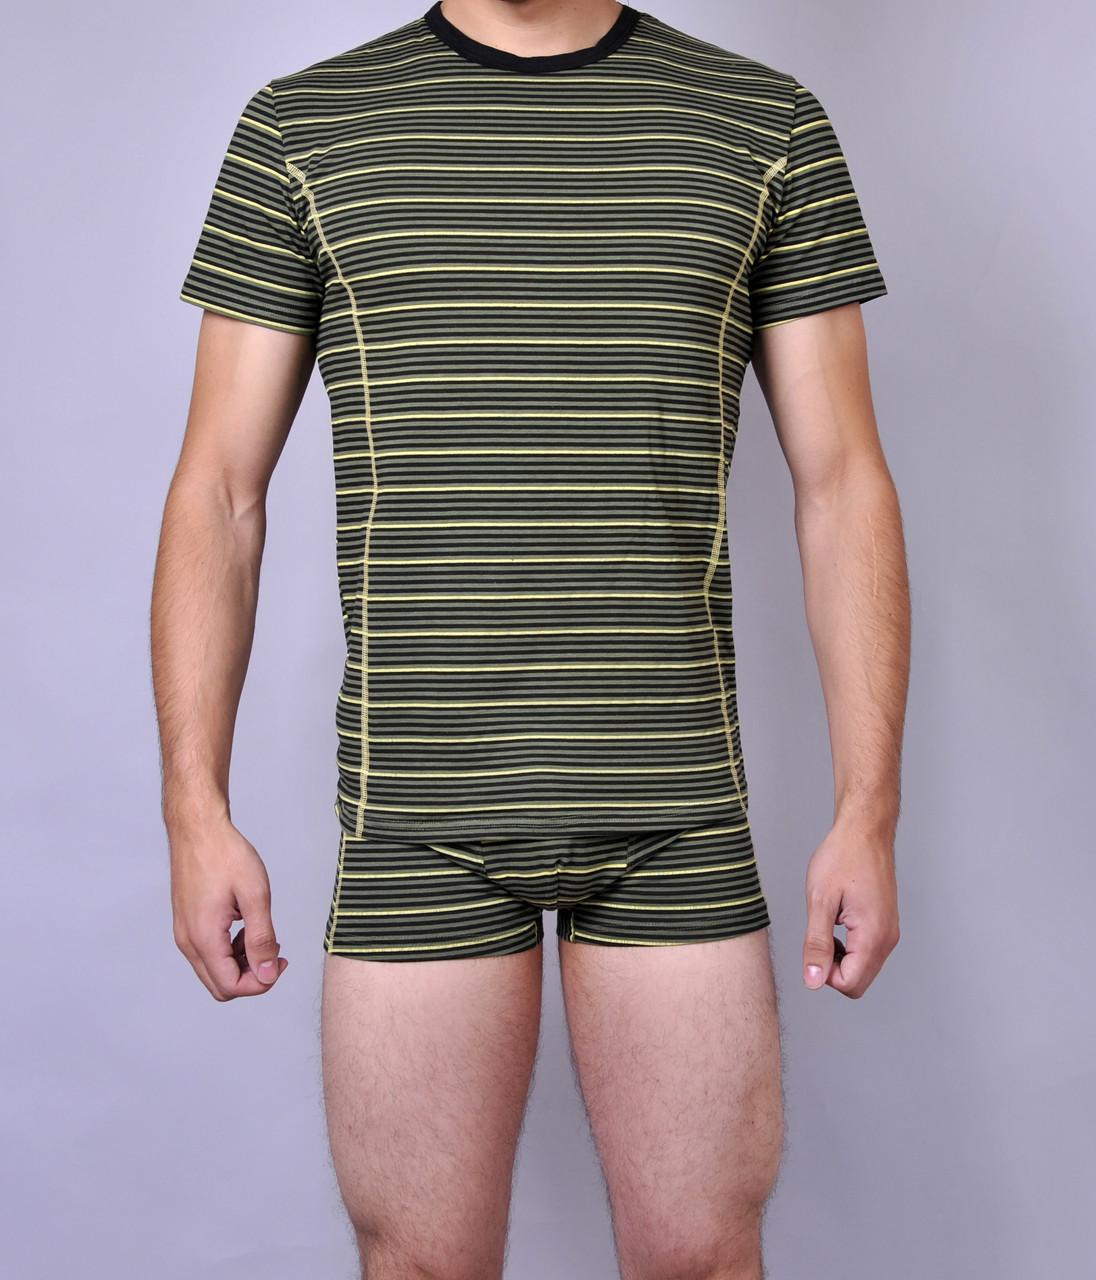 Мужская футболка  C+3 0115 M Зеленый